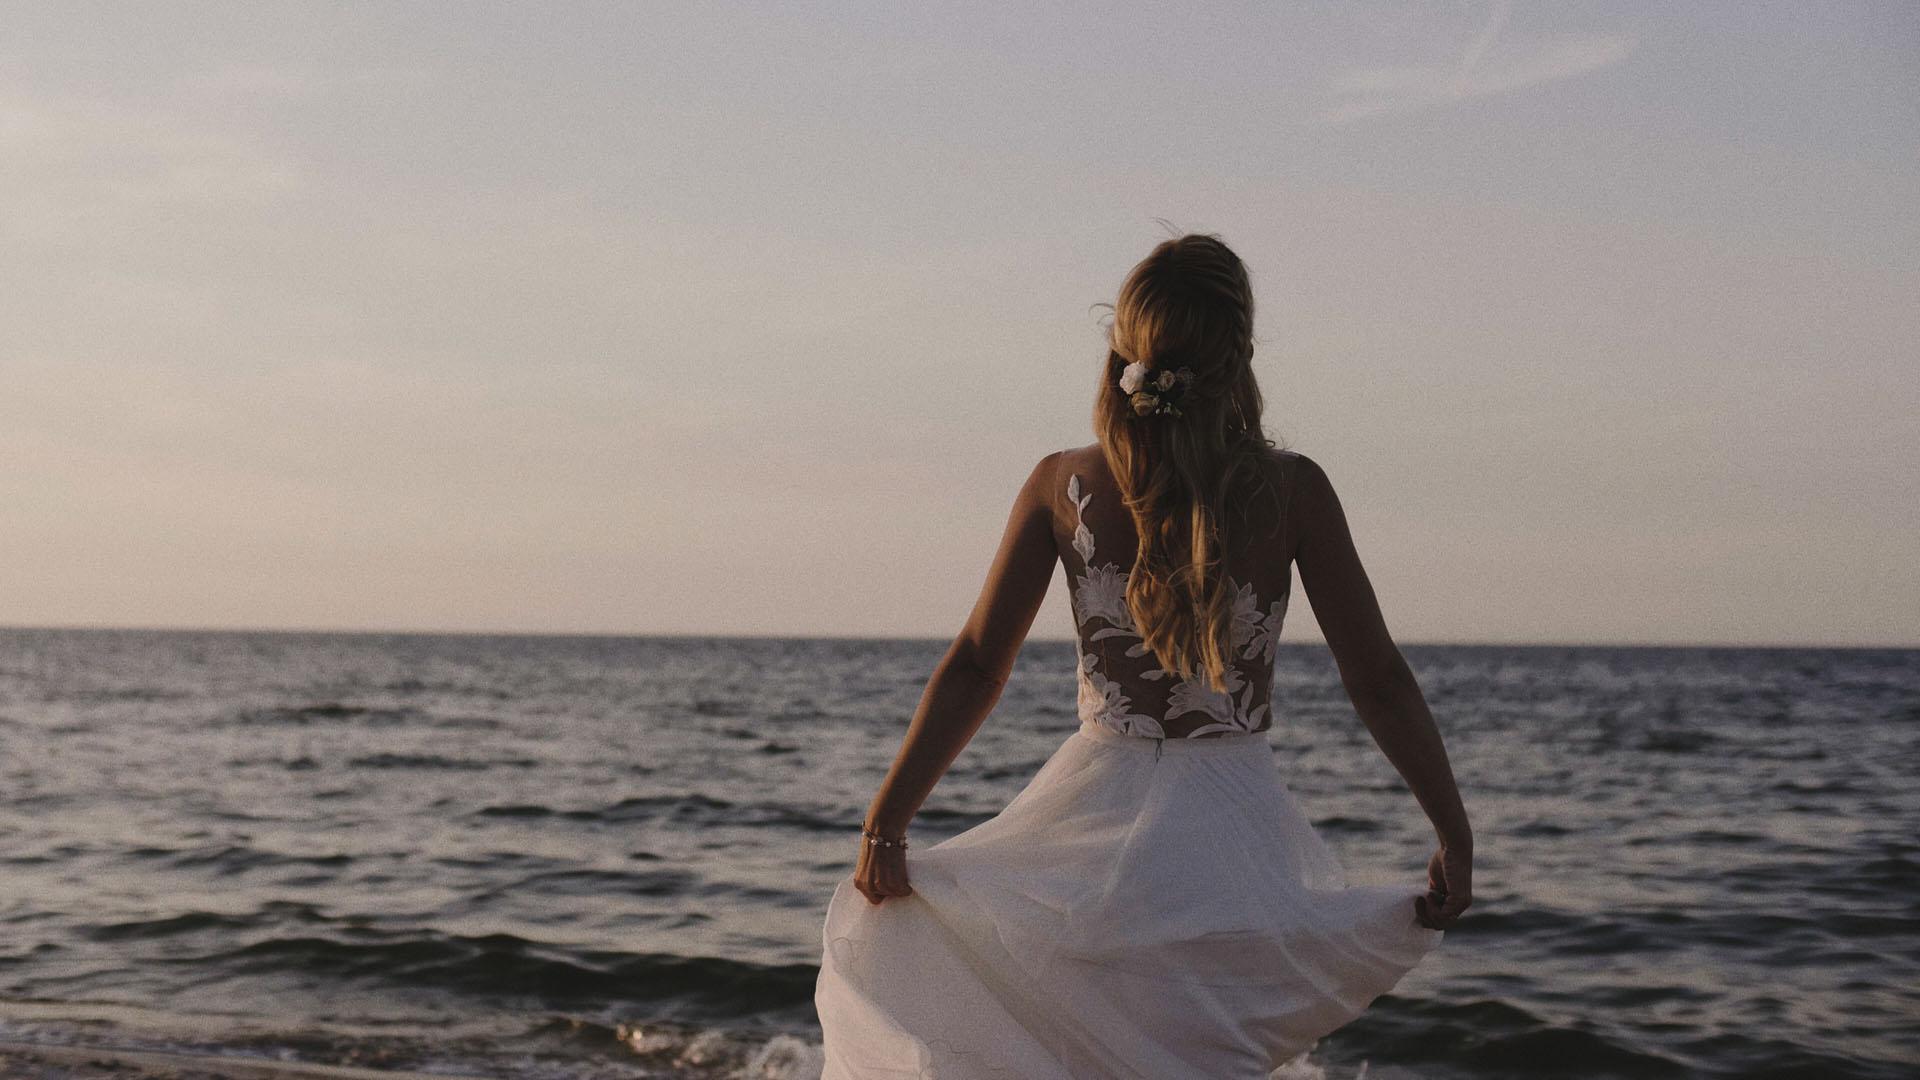 21 sesja ślubna nad morzem panna młoda